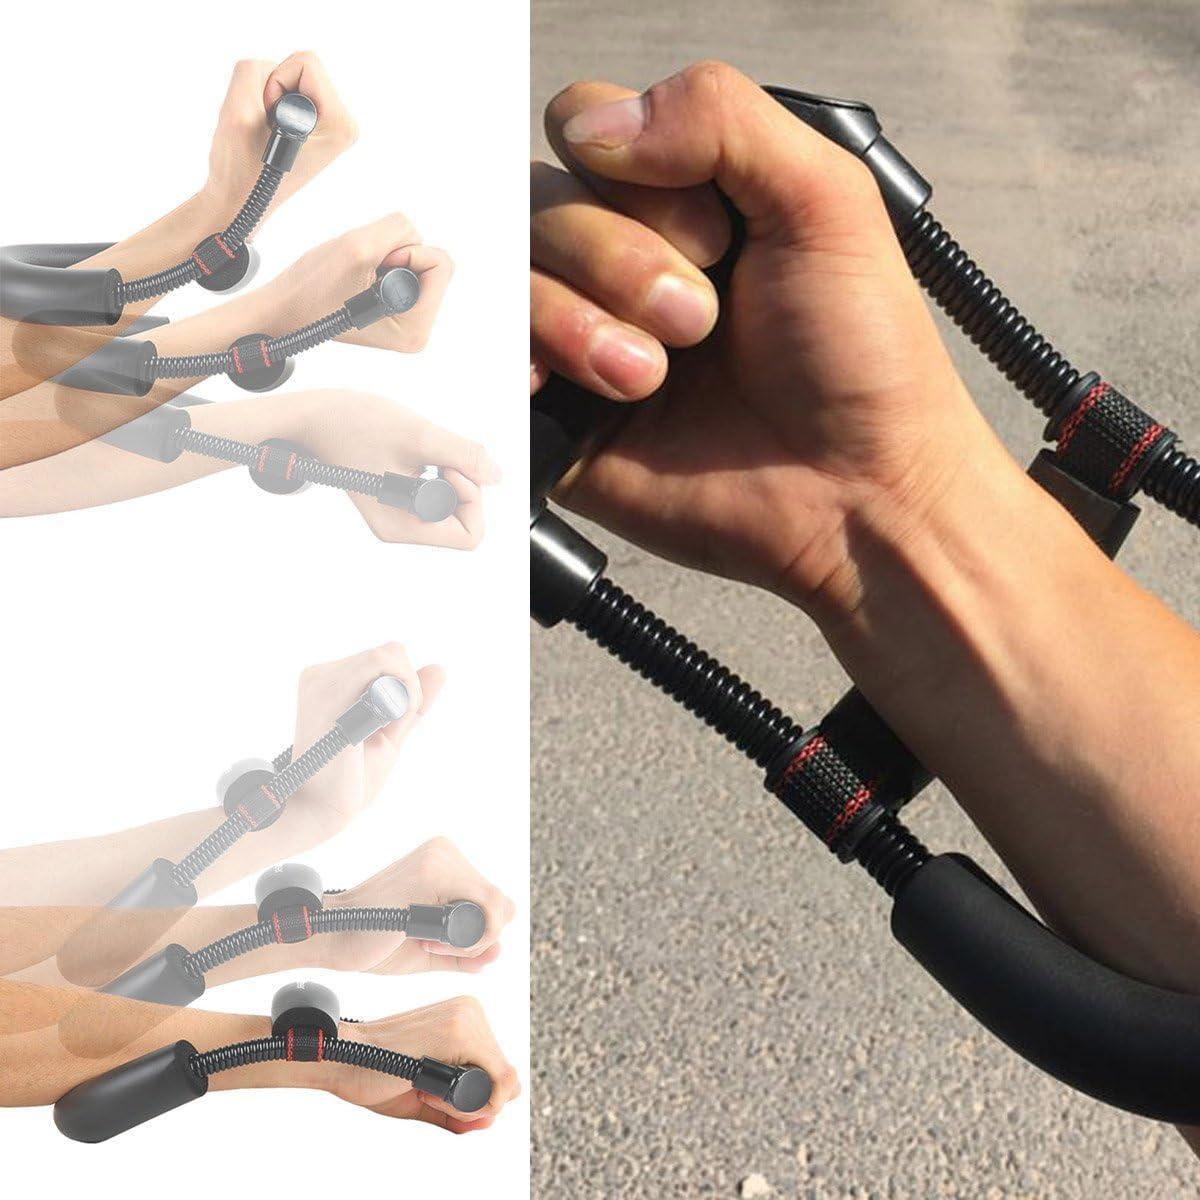 Wrist Grip Arm Hand Gripper Forearm Device Indoor Fitness Equipment Power